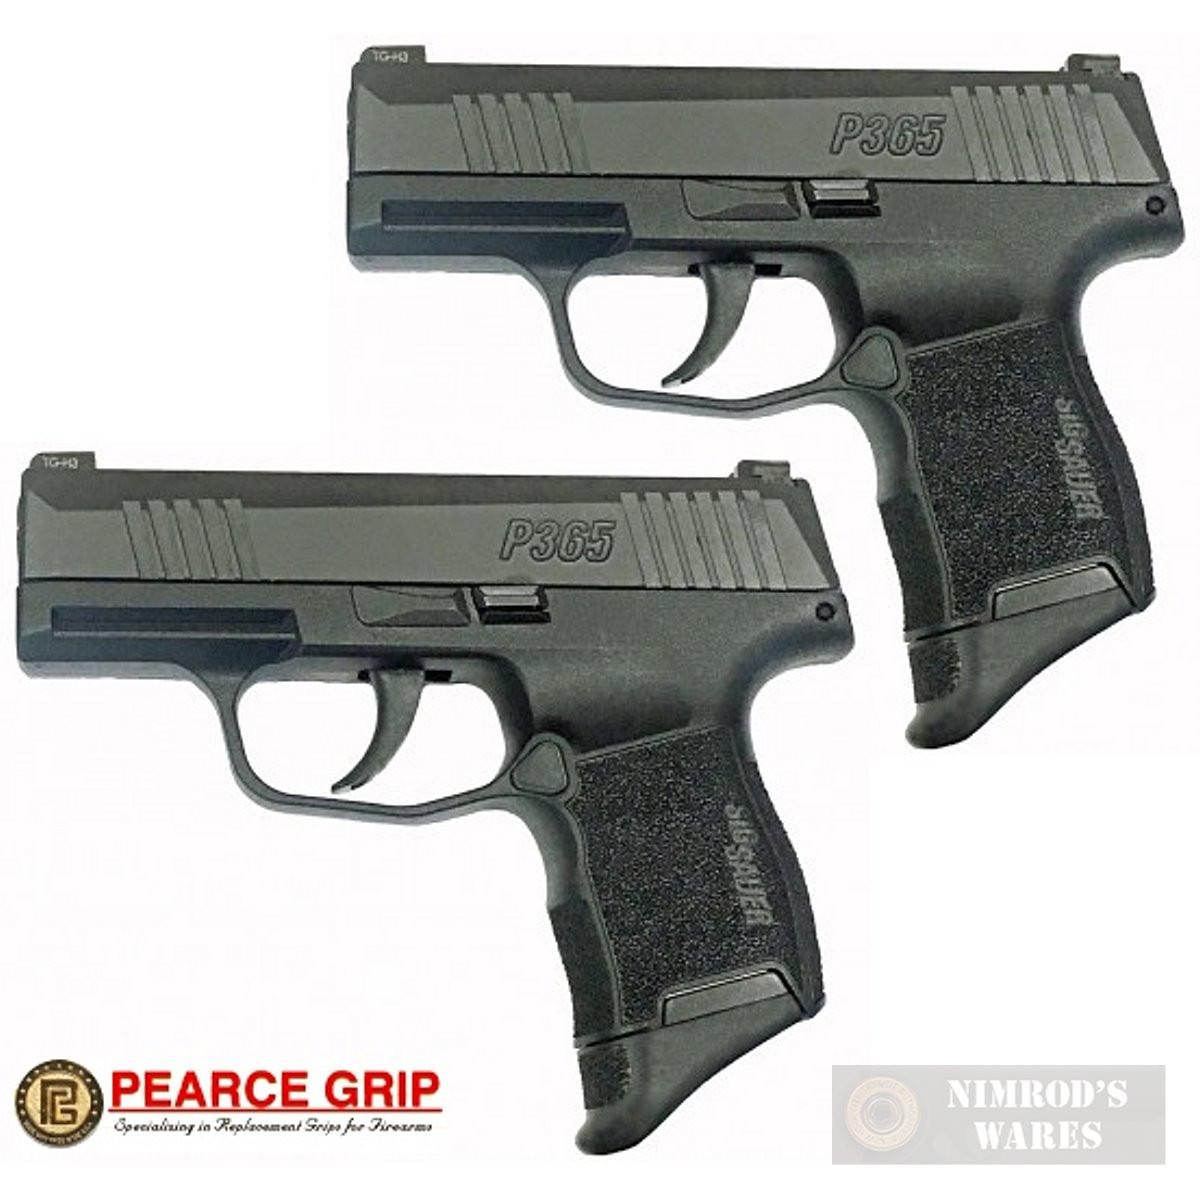 Pearce Grip SIG SAUER P365 GRIP EXTENSION 2-PACK 5/8